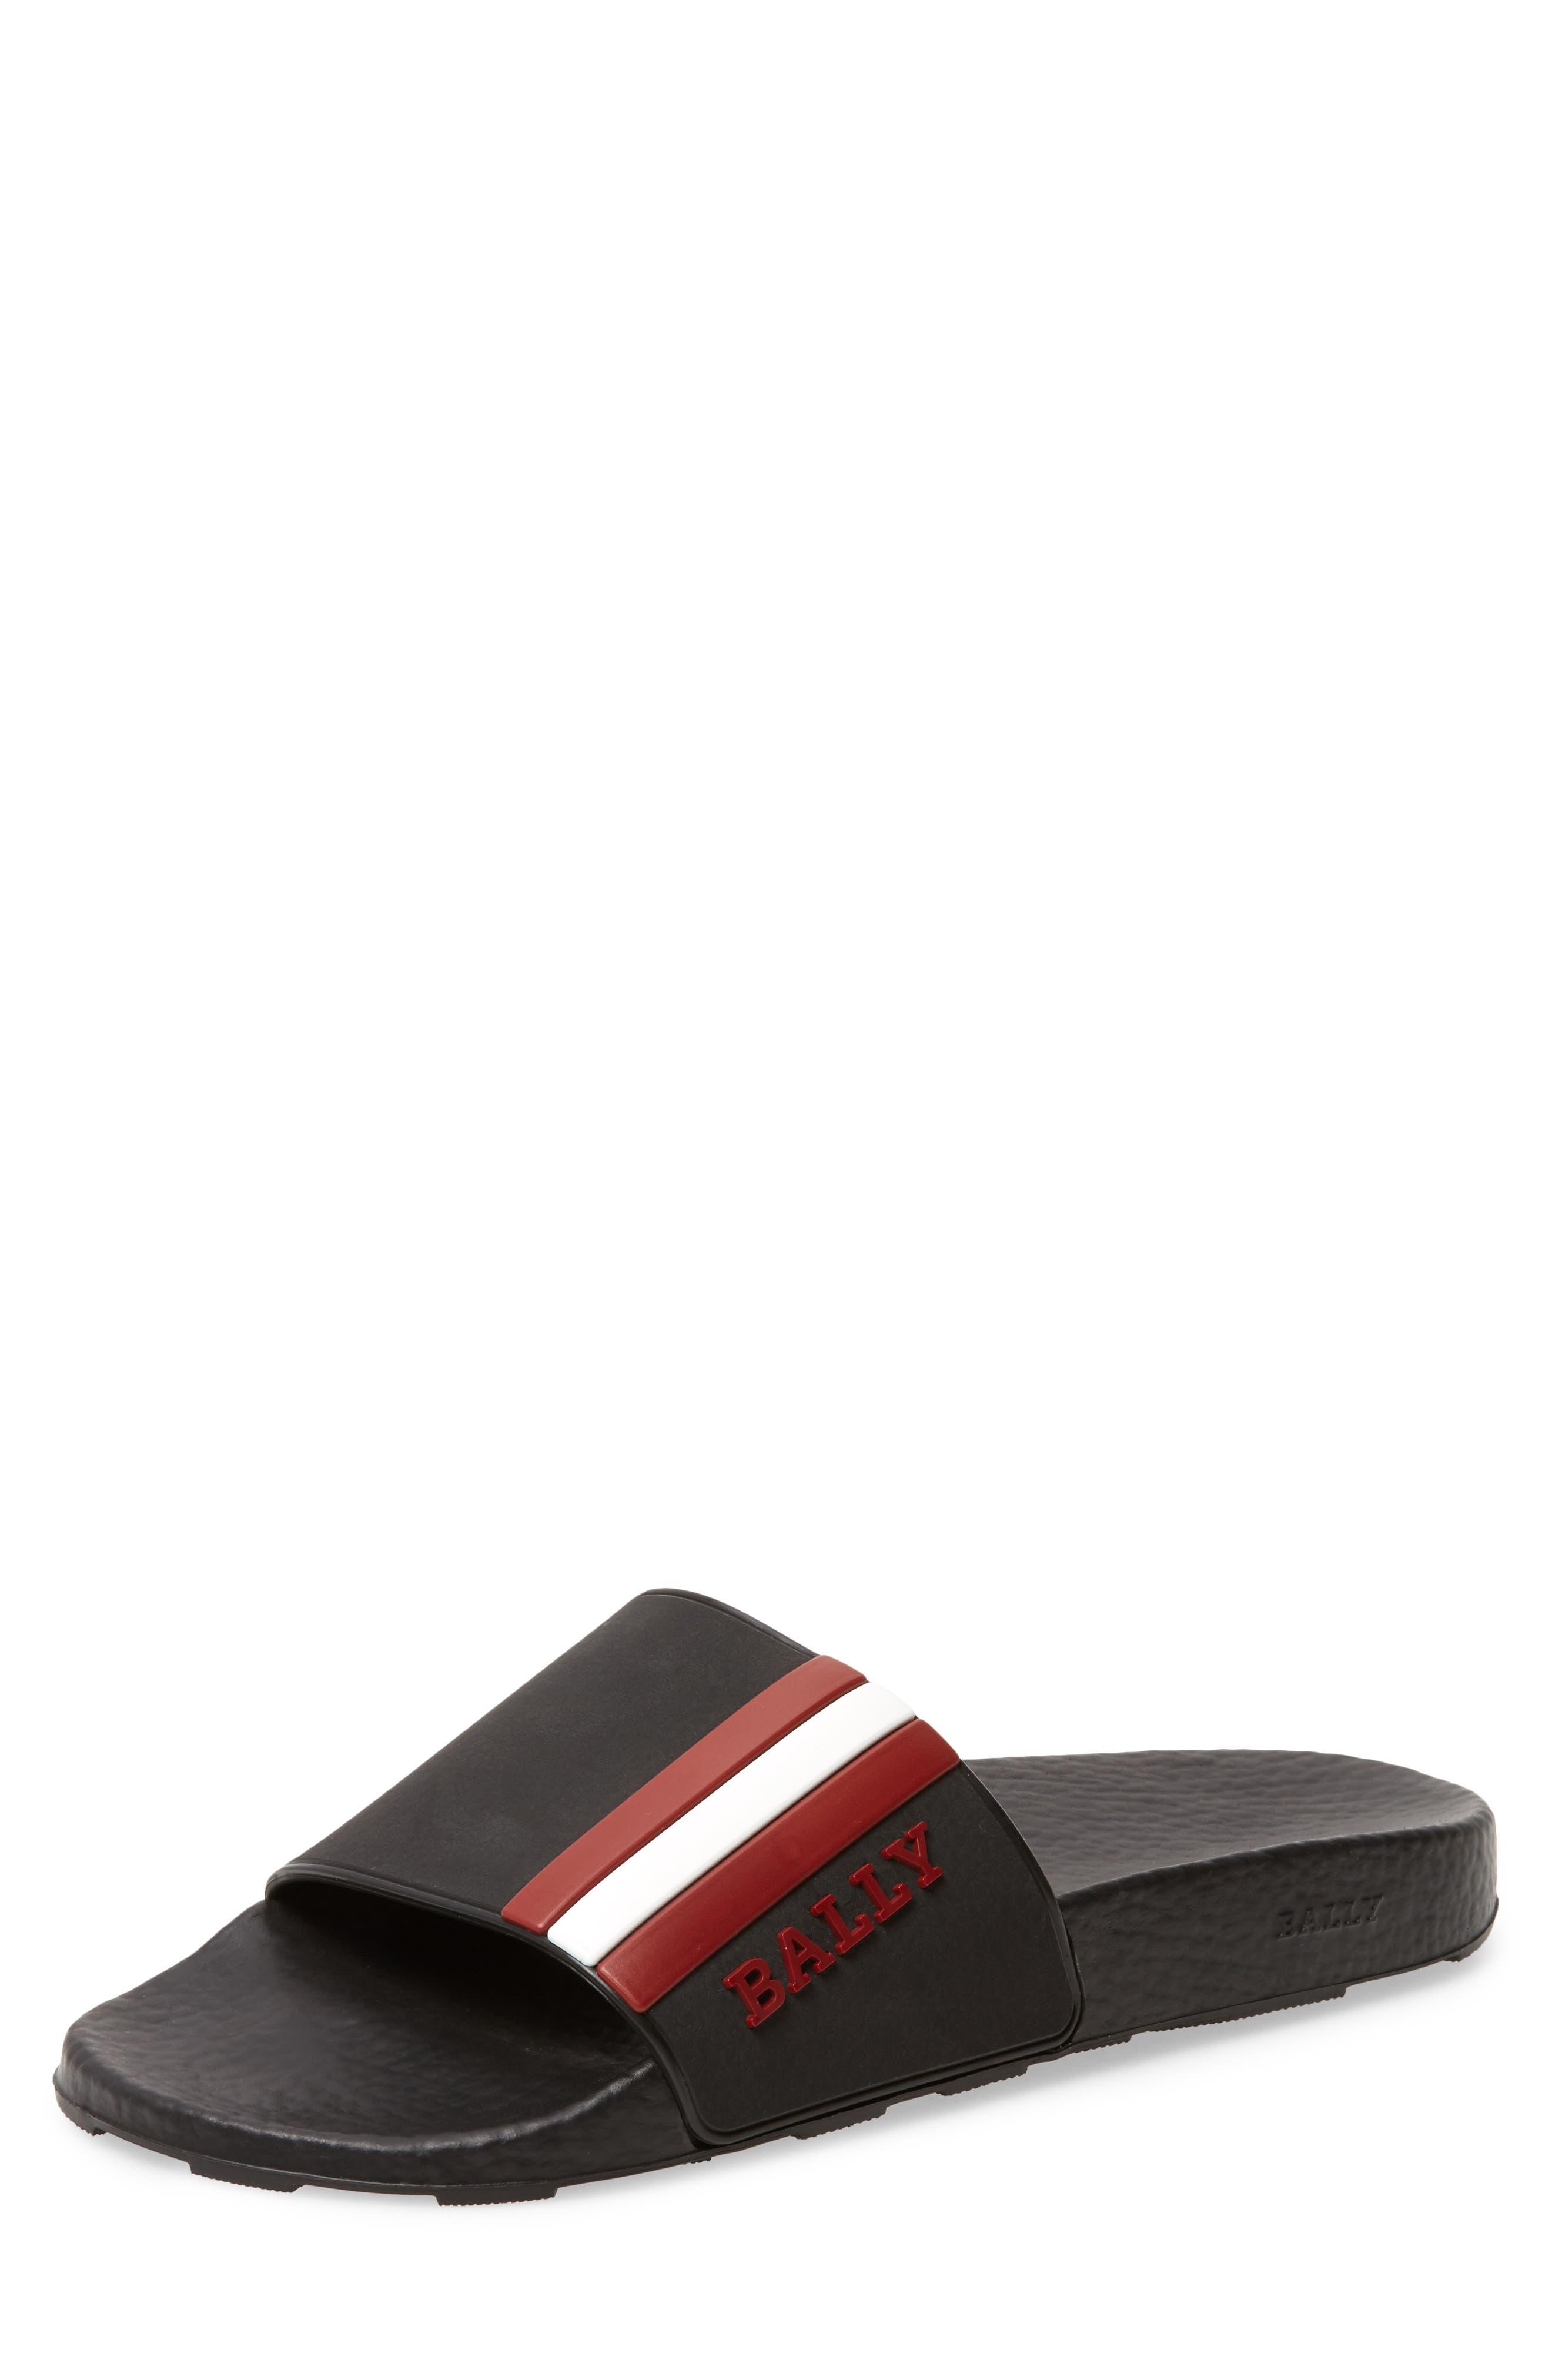 BALLY,                             Saxor Slide Sandal,                             Main thumbnail 1, color,                             798